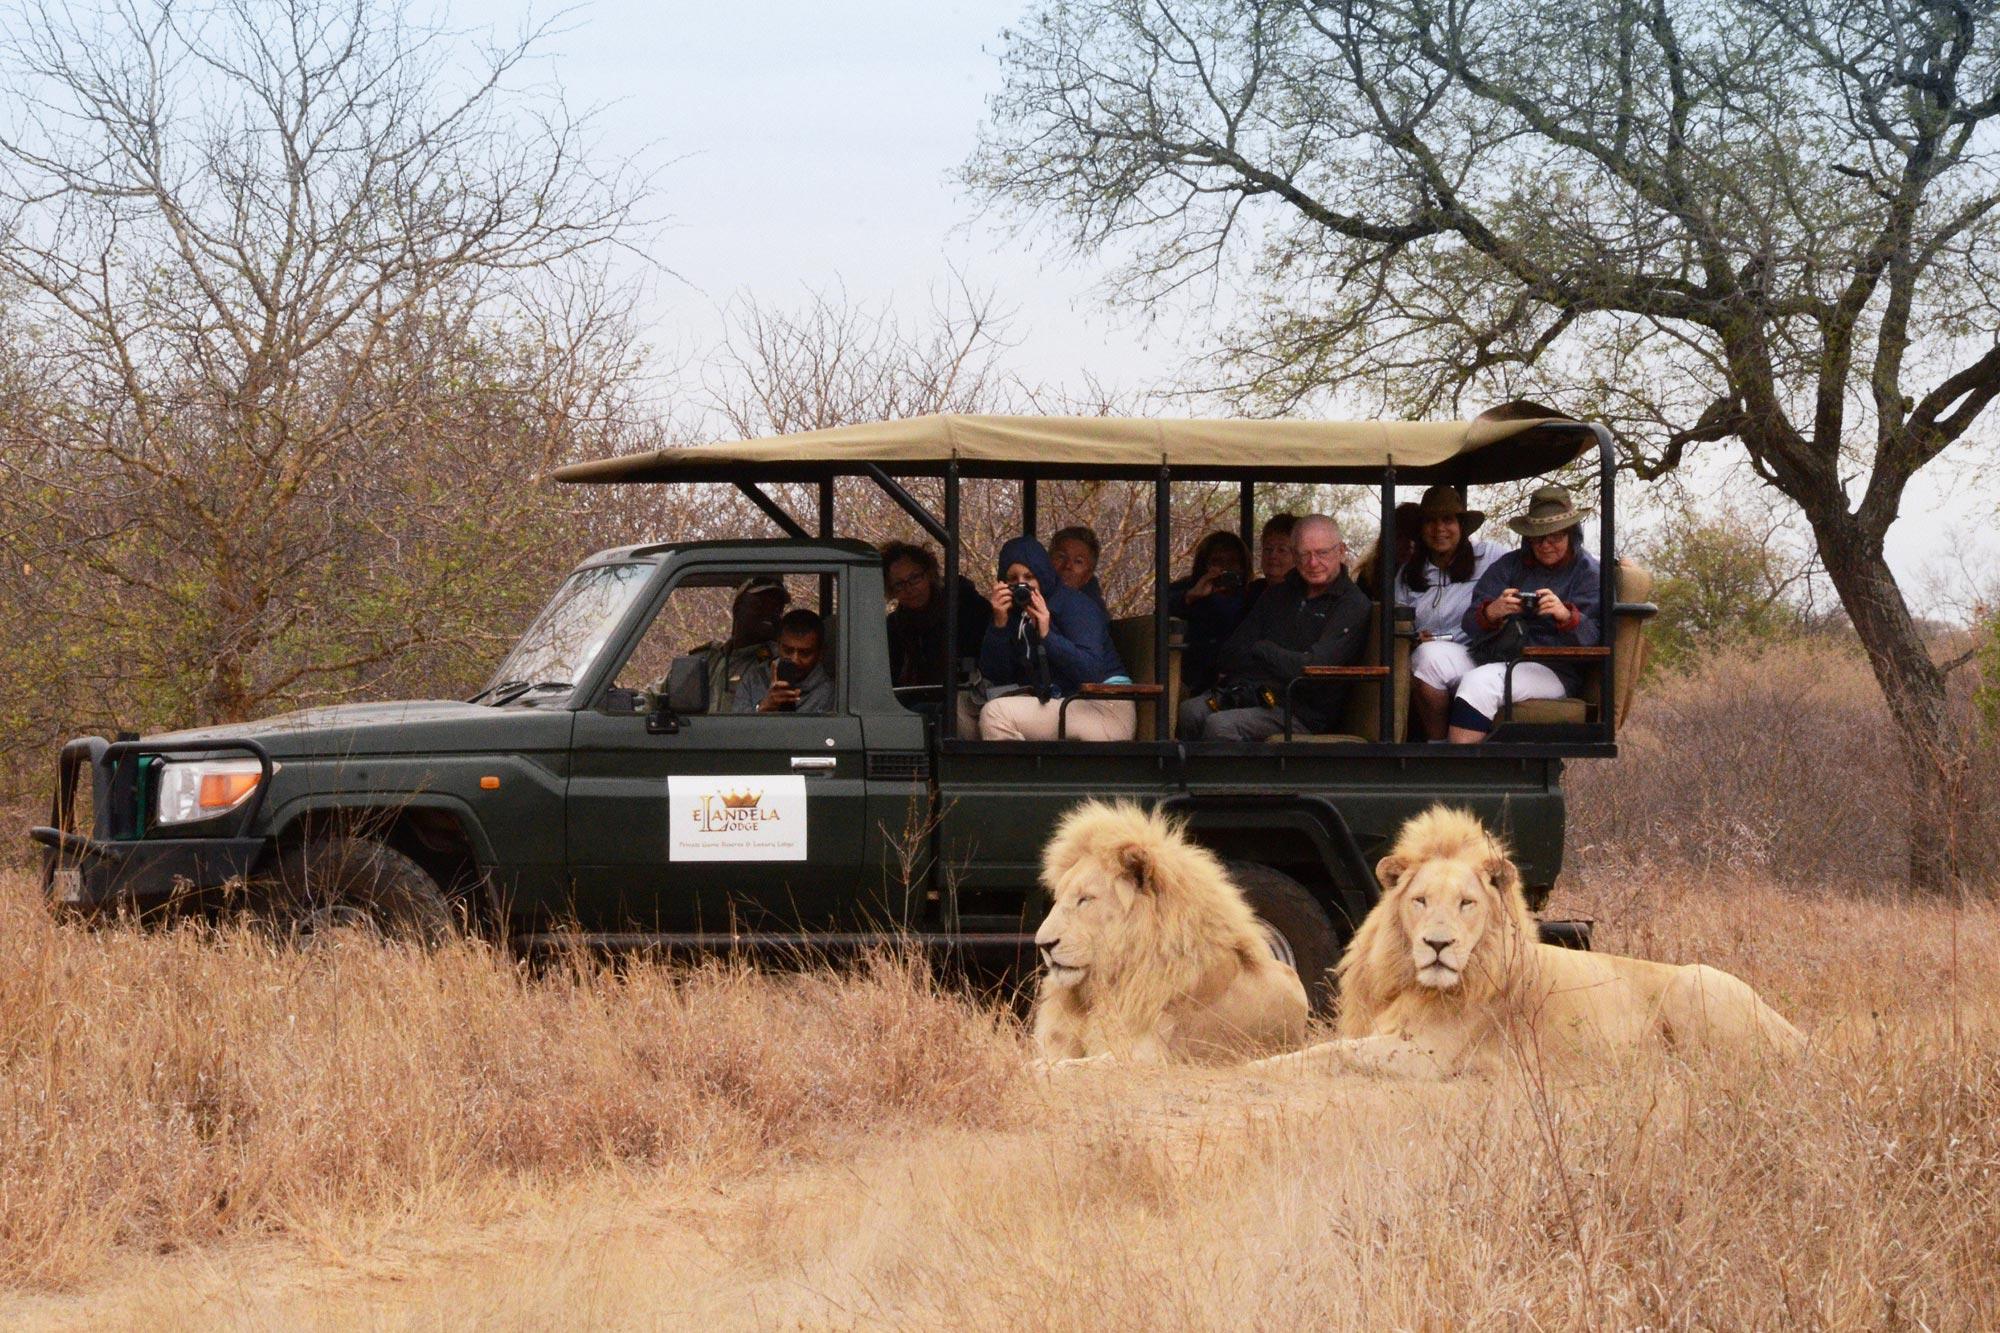 South Africa Safari Holidays